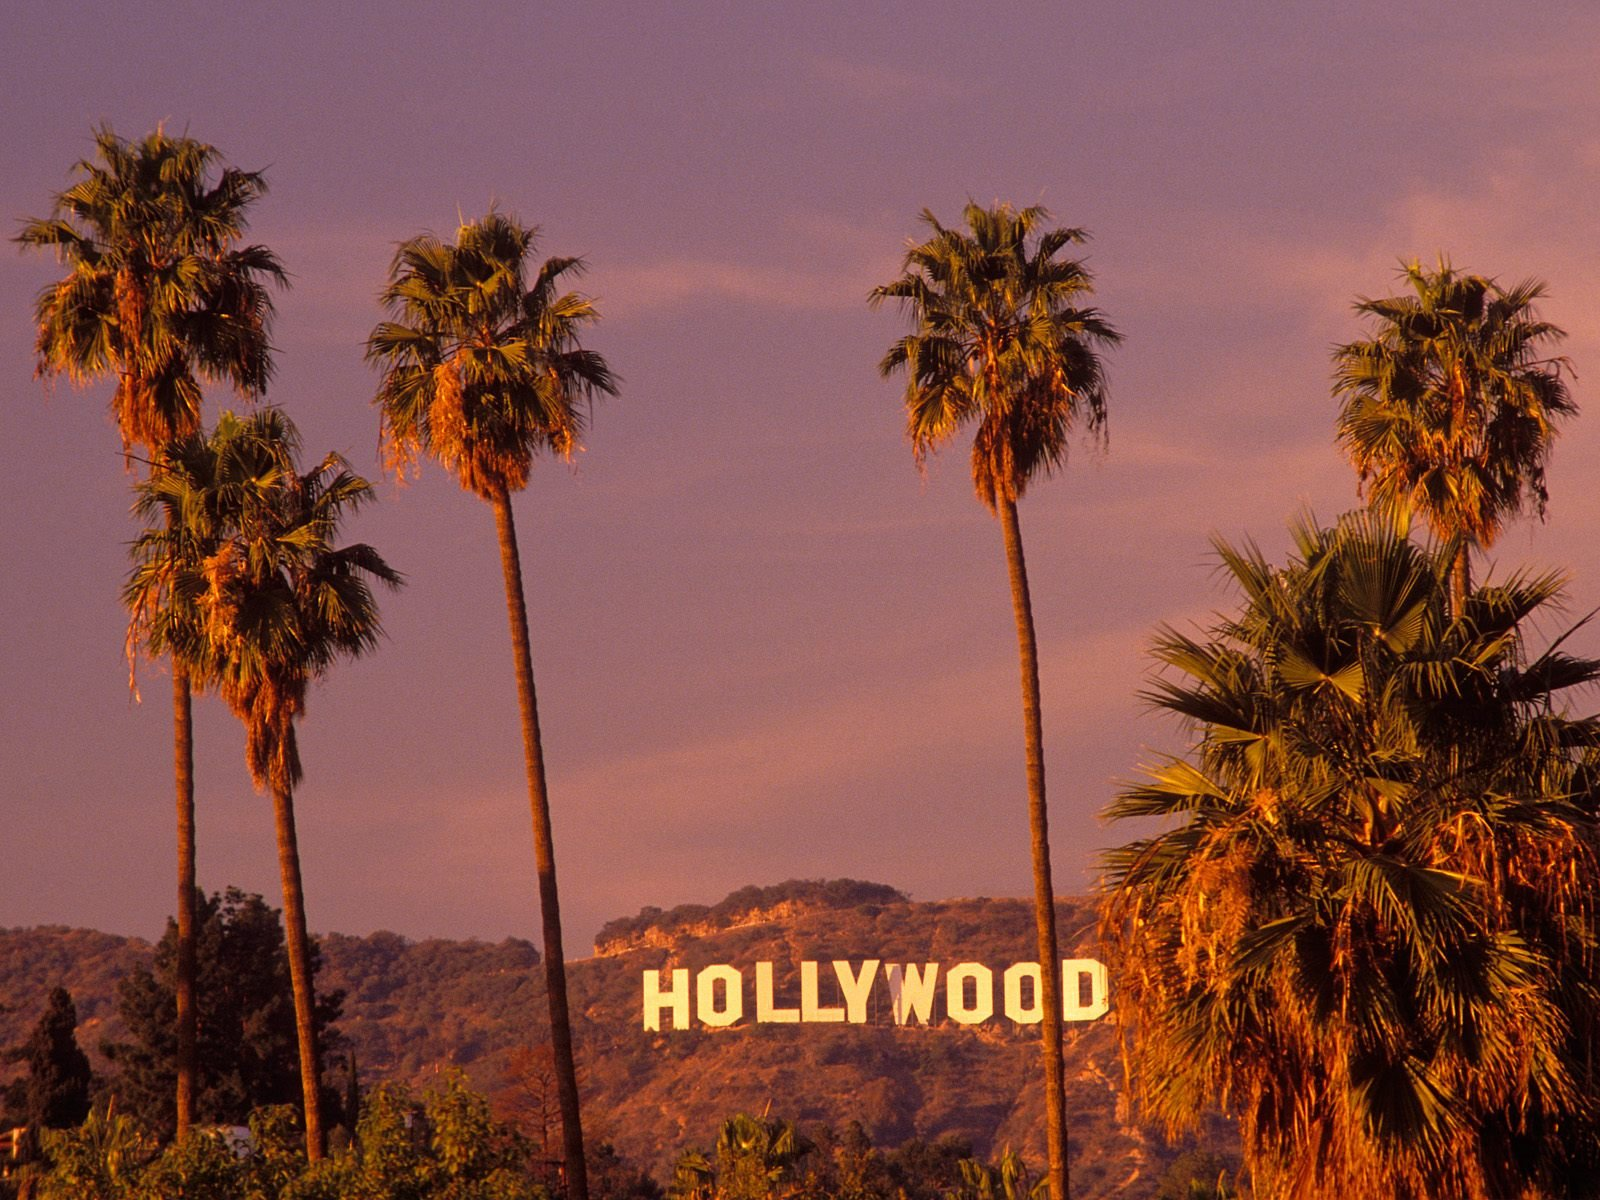 48] Hollywood Wallpaper Desktop on WallpaperSafari 1600x1200